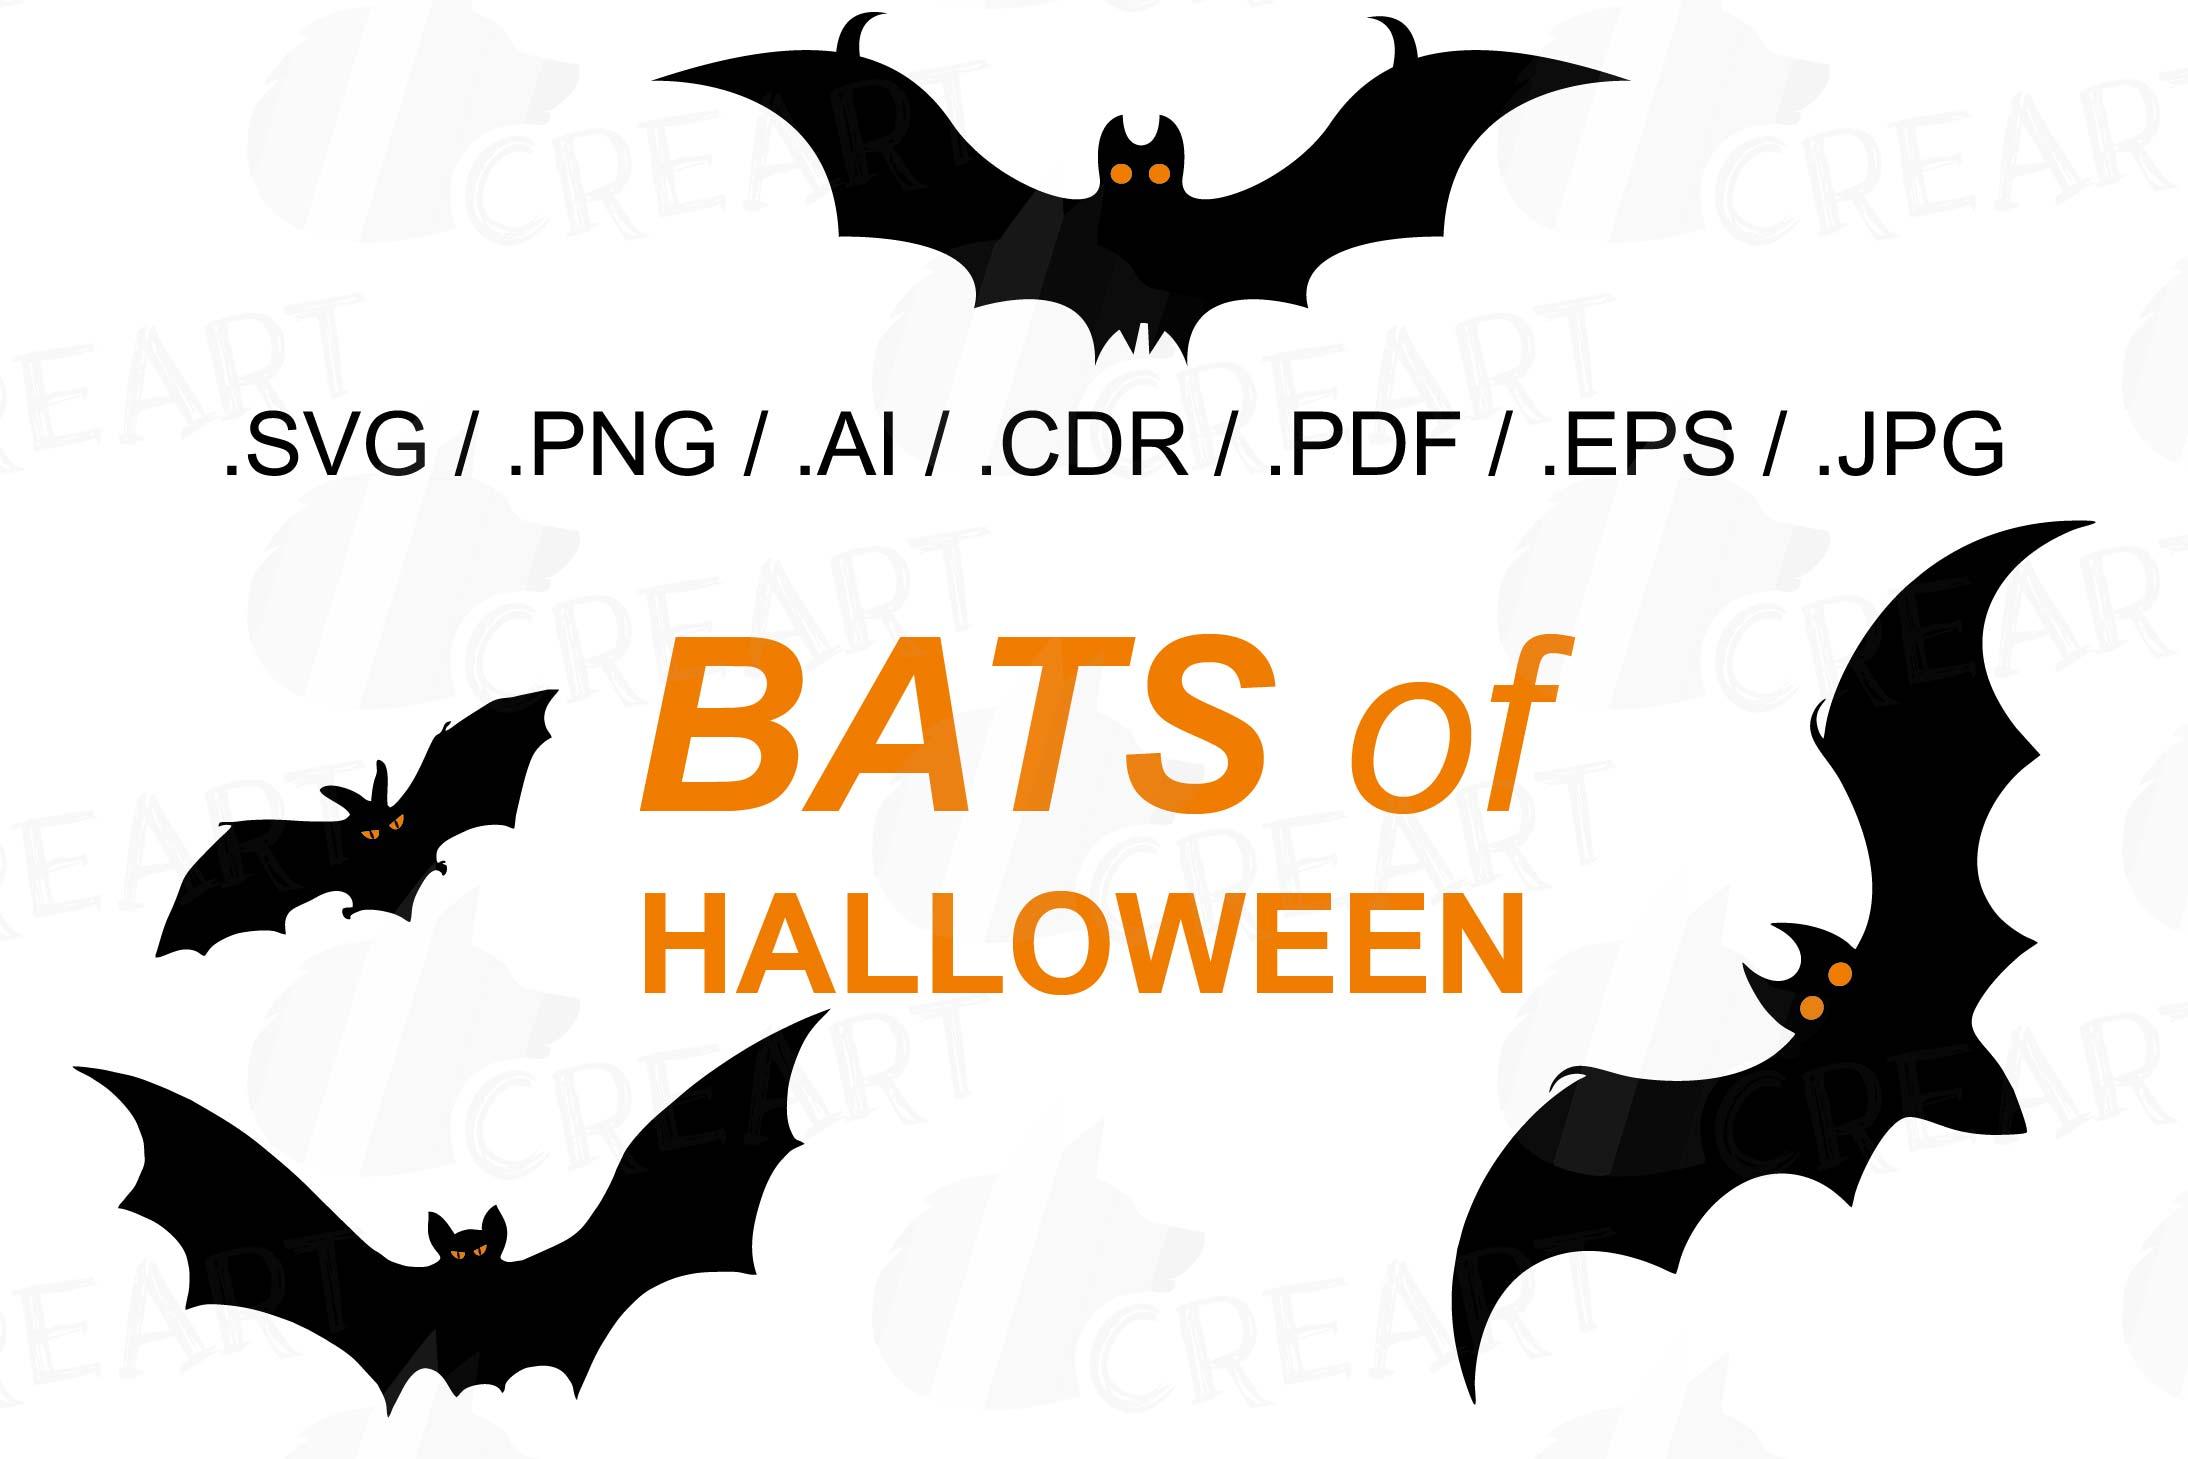 halloween bats silhouettes clip art halloween party vectors example image 1